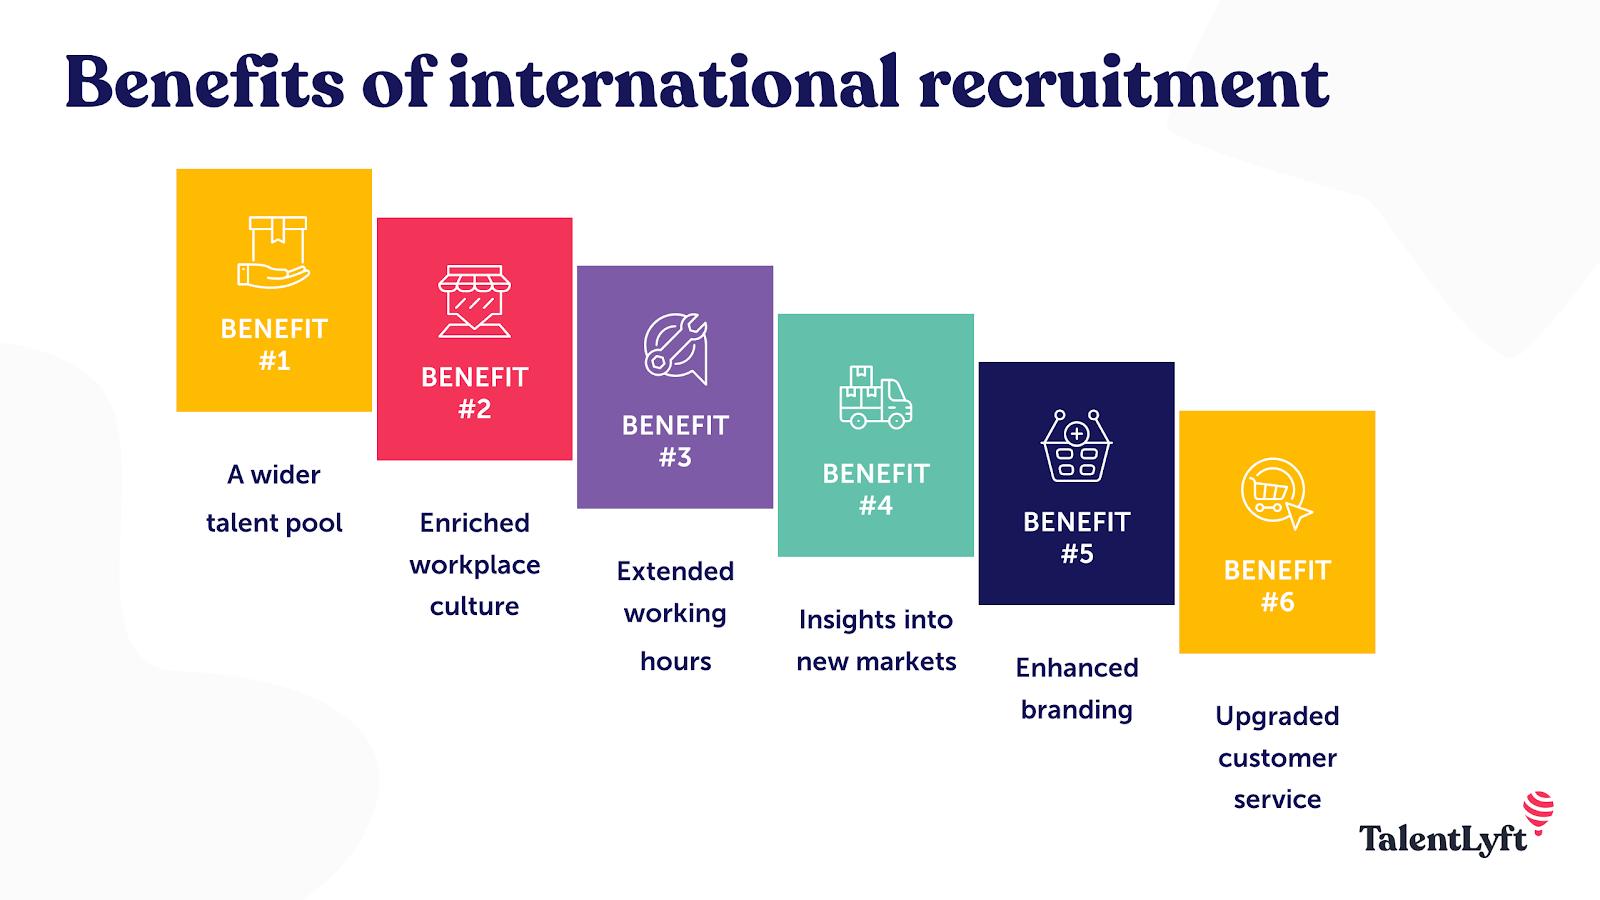 Benefits of international recruitment